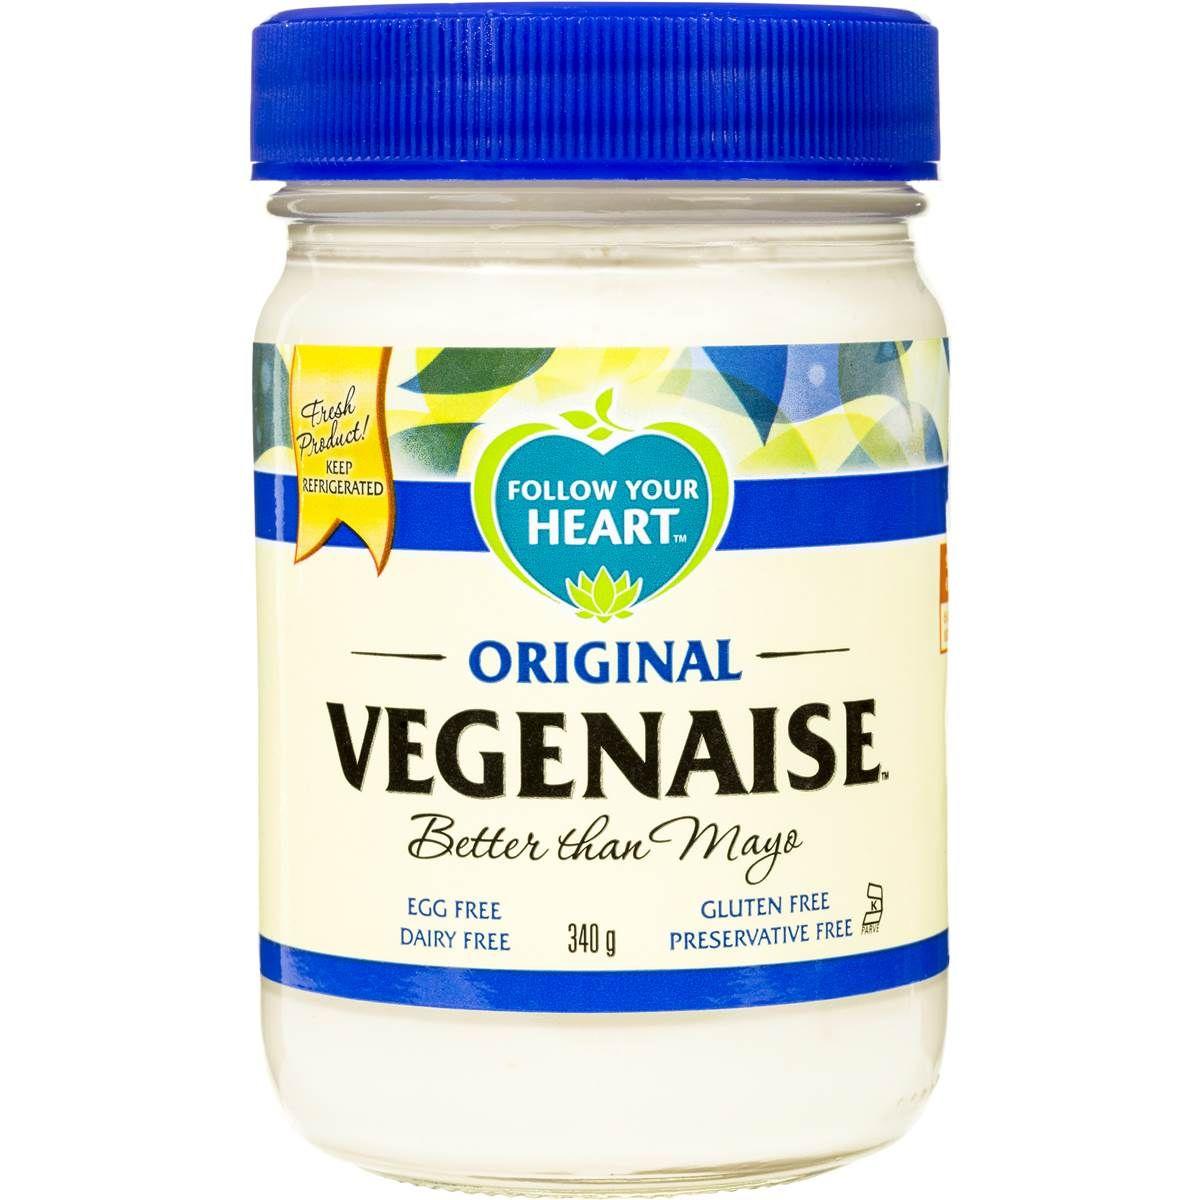 Follow Your Heart Original Vegenaise Image Front Vegan Grocery List Follow Your Heart Vegan Mayo